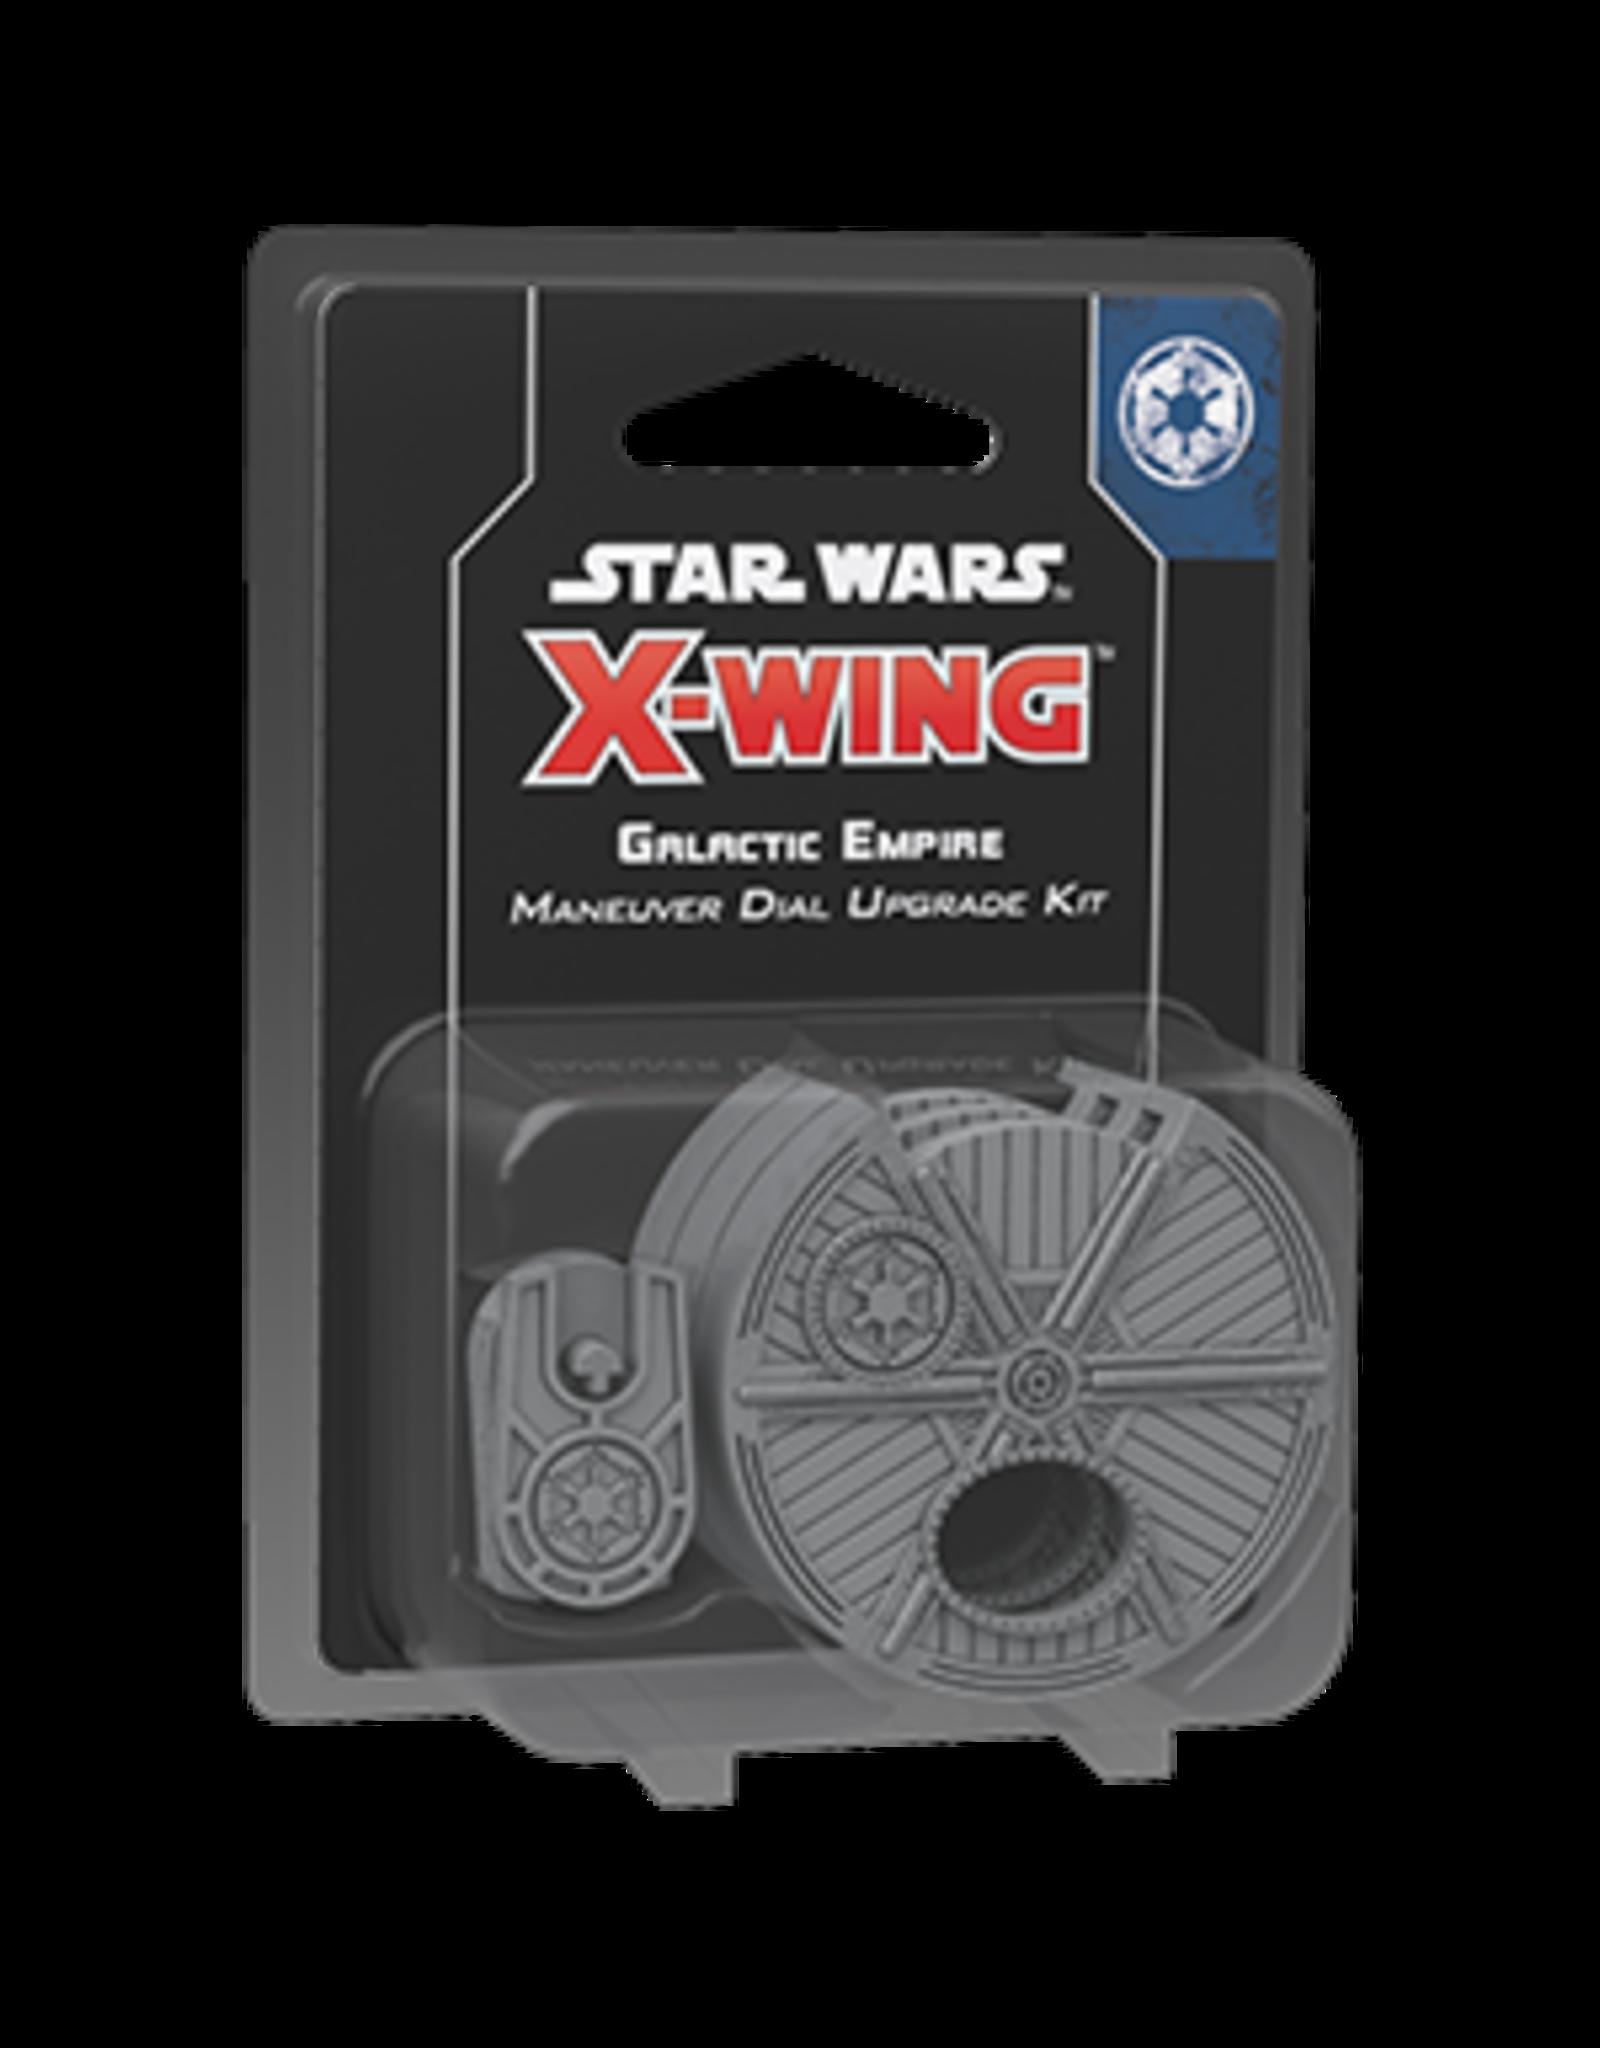 Fantasy Flight Games Star Wars X-wing 2E: Galactic Empire Manuever Dial Kit